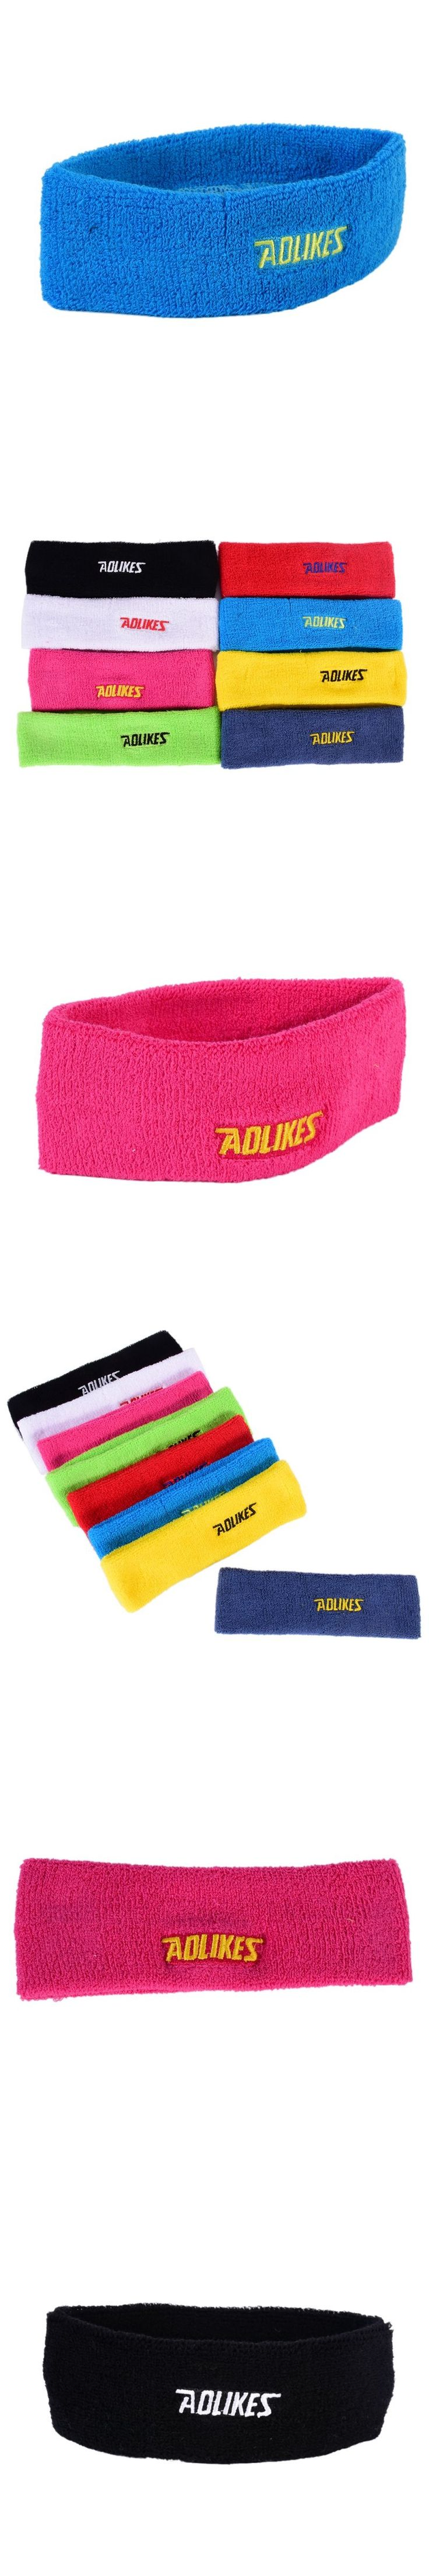 AOLIKES Solid Sweatband Sports Sportswear Safety Headband For Men Sweatband women Yoga Hair Bands Head Sweat 2017 New Arrival